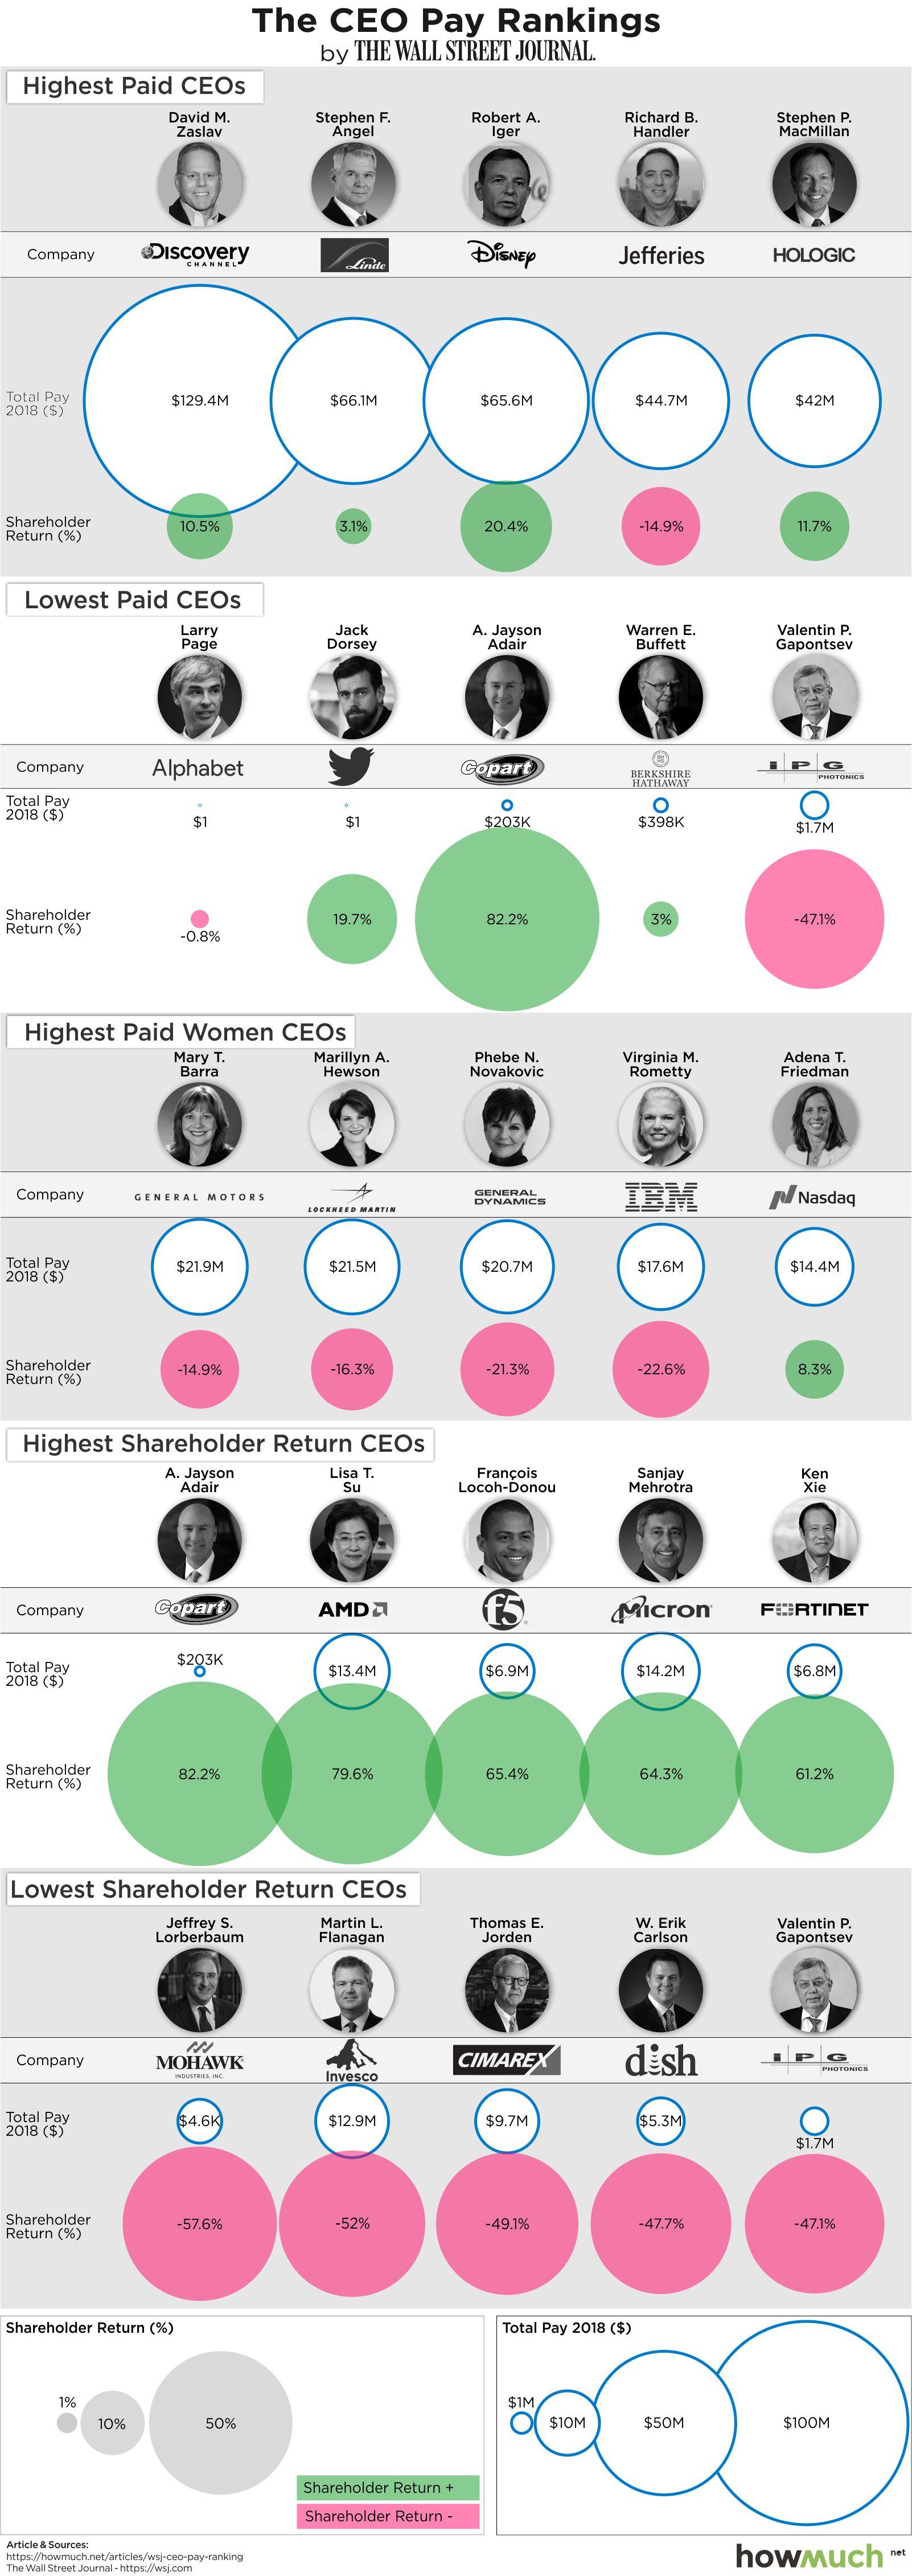 Highest Paid CEOs